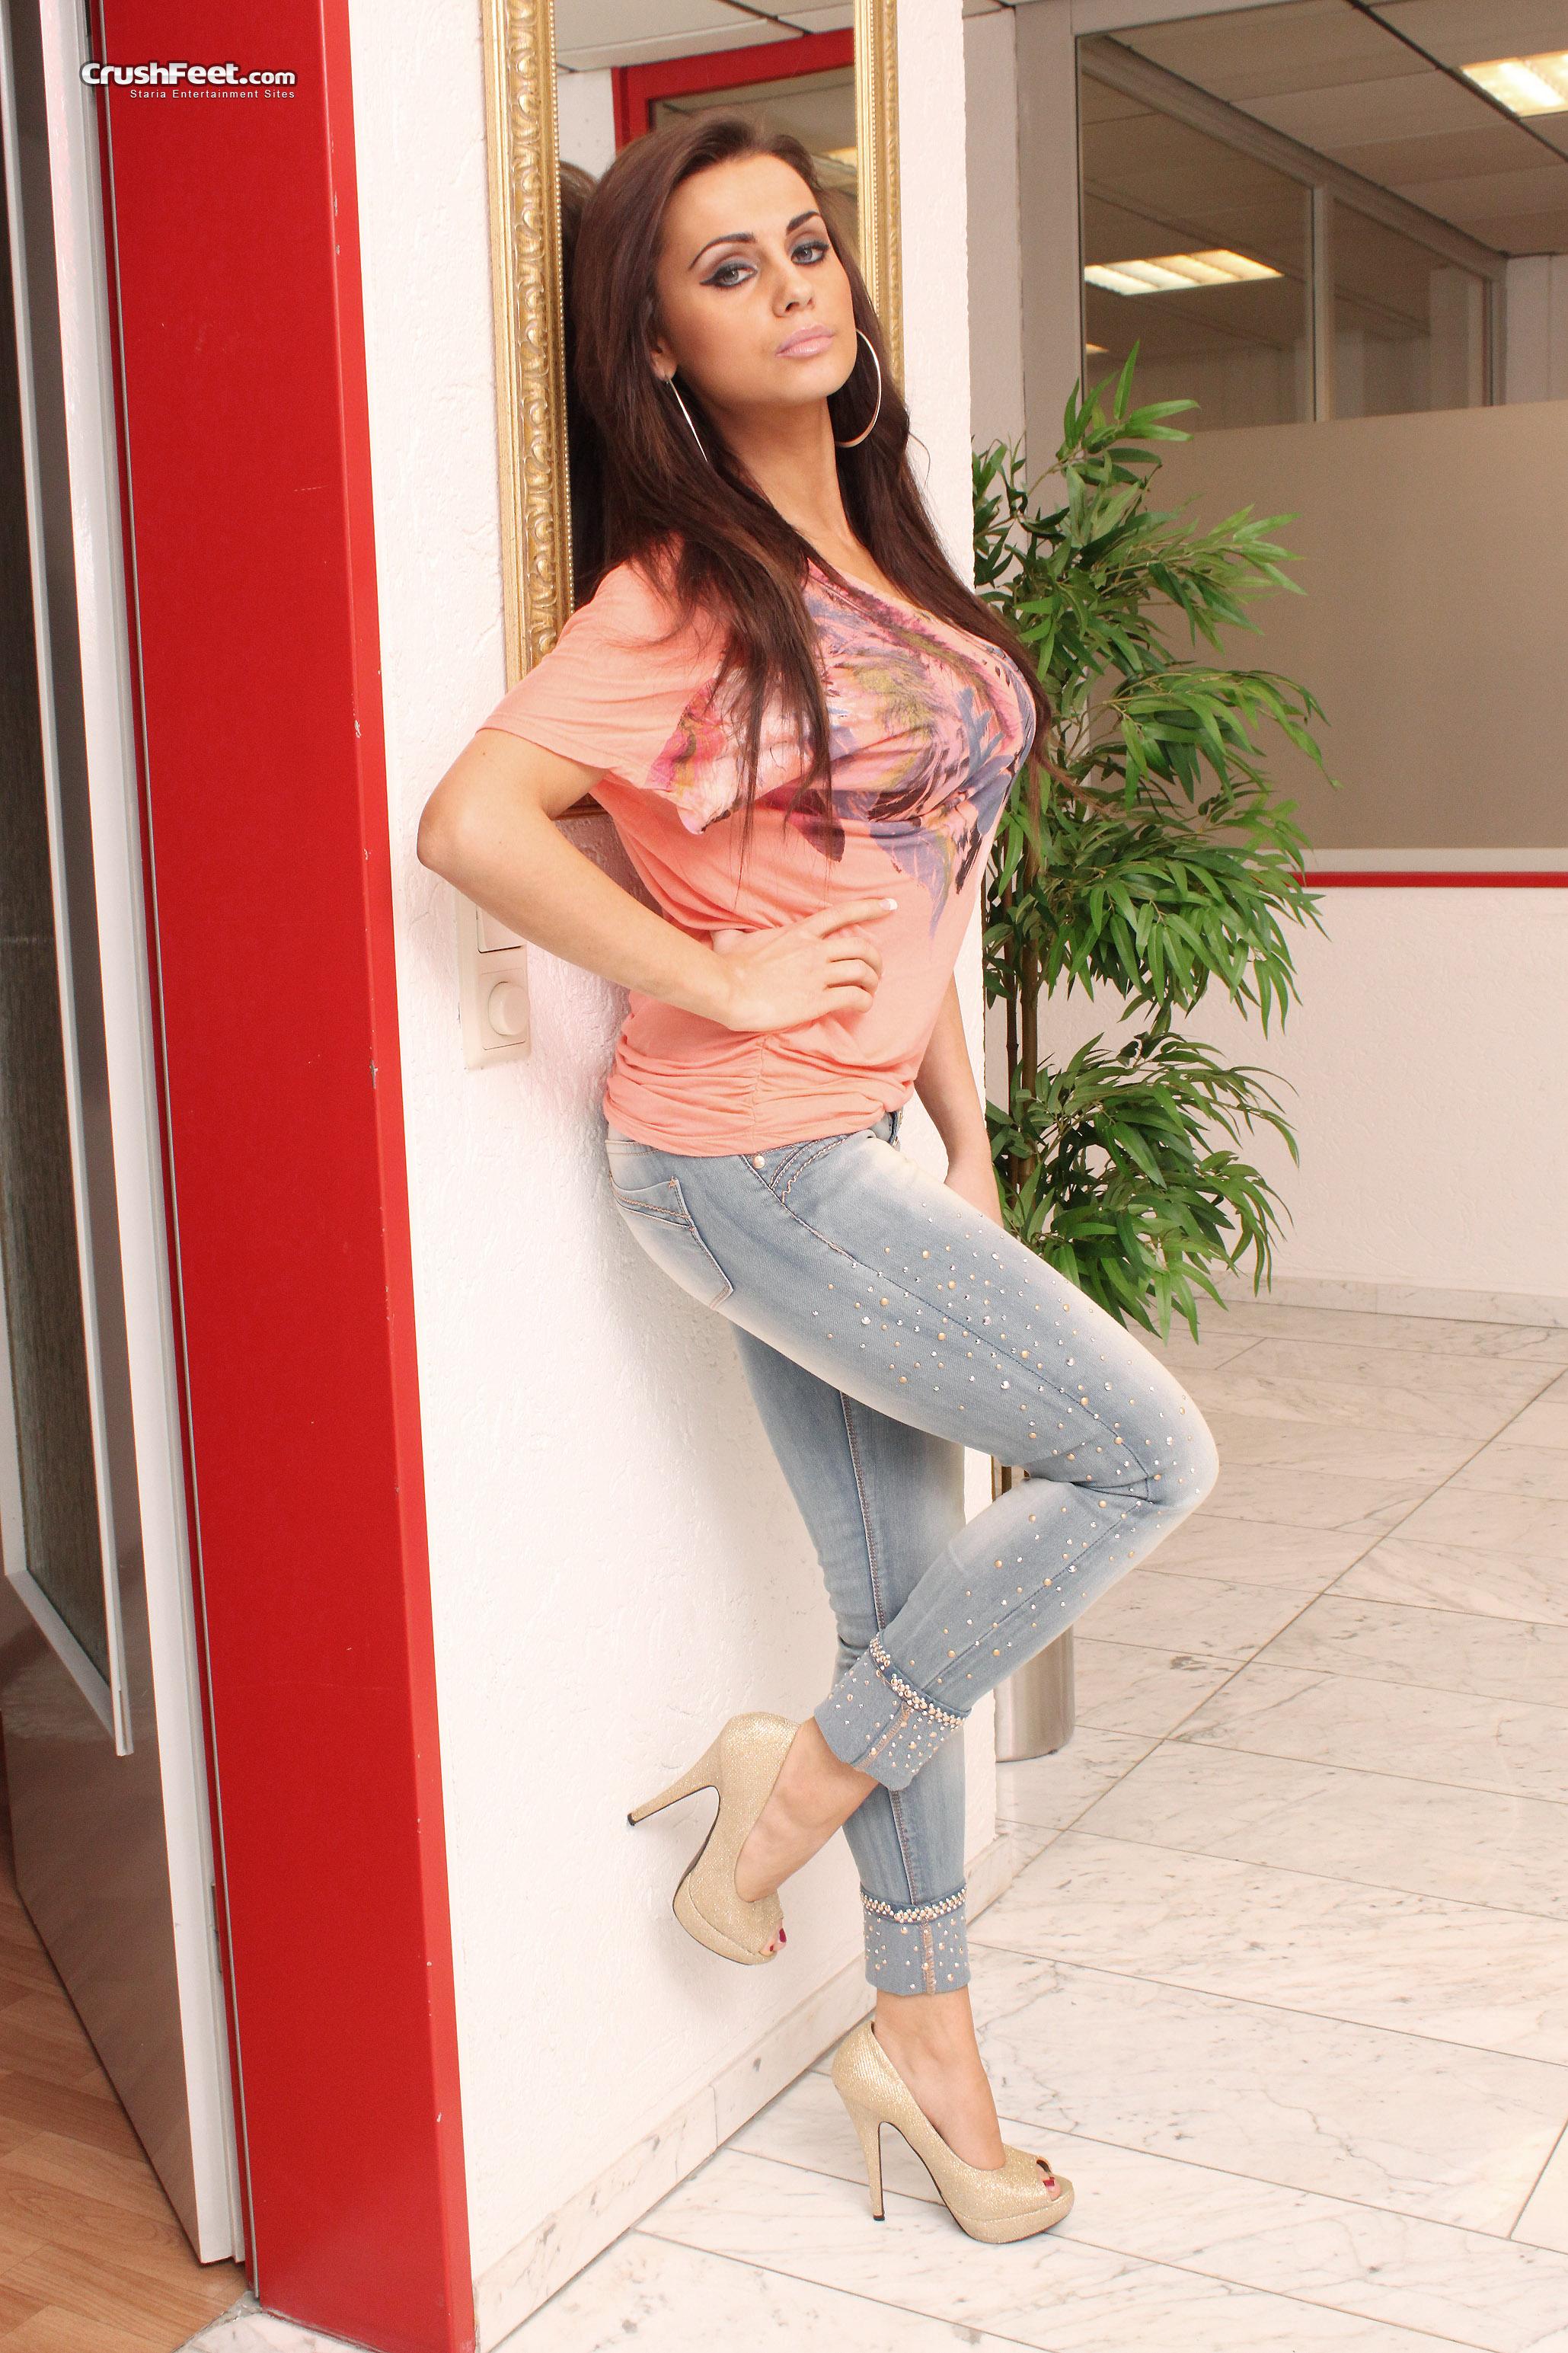 382252783_Natalya_001242_04_122_171lo.jpg